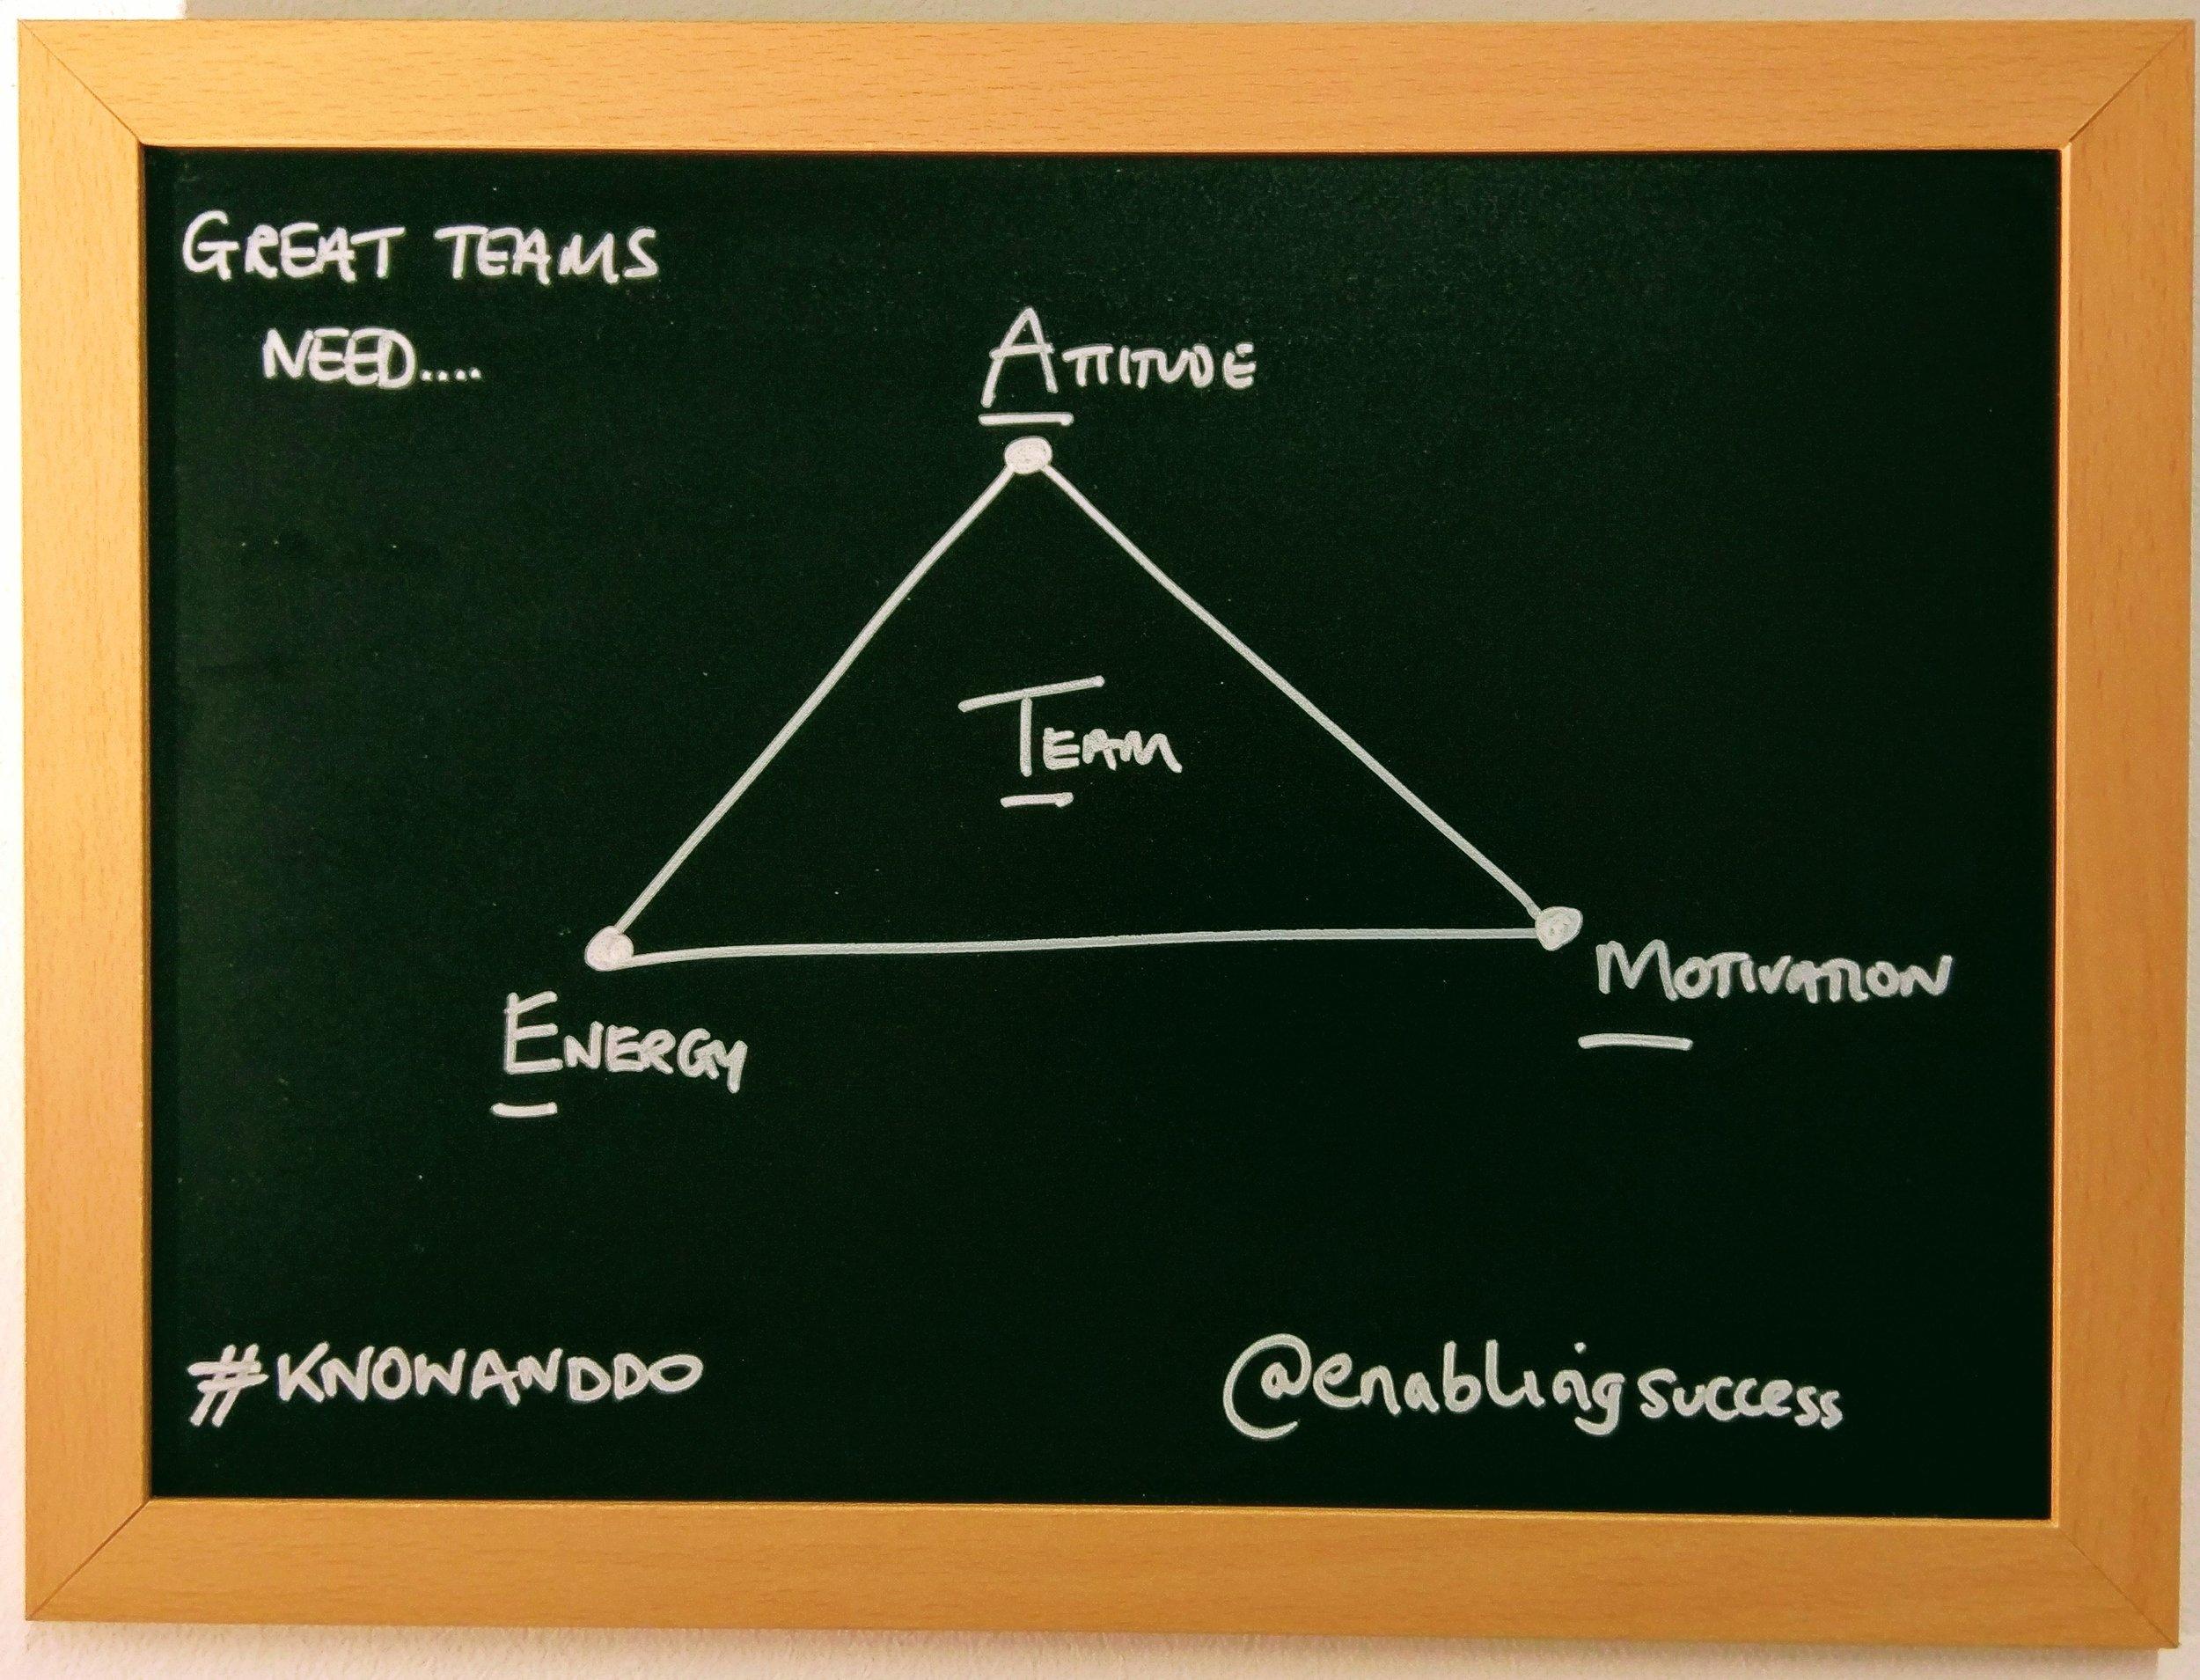 Planning A Great Team - Energy Attitude Motivation